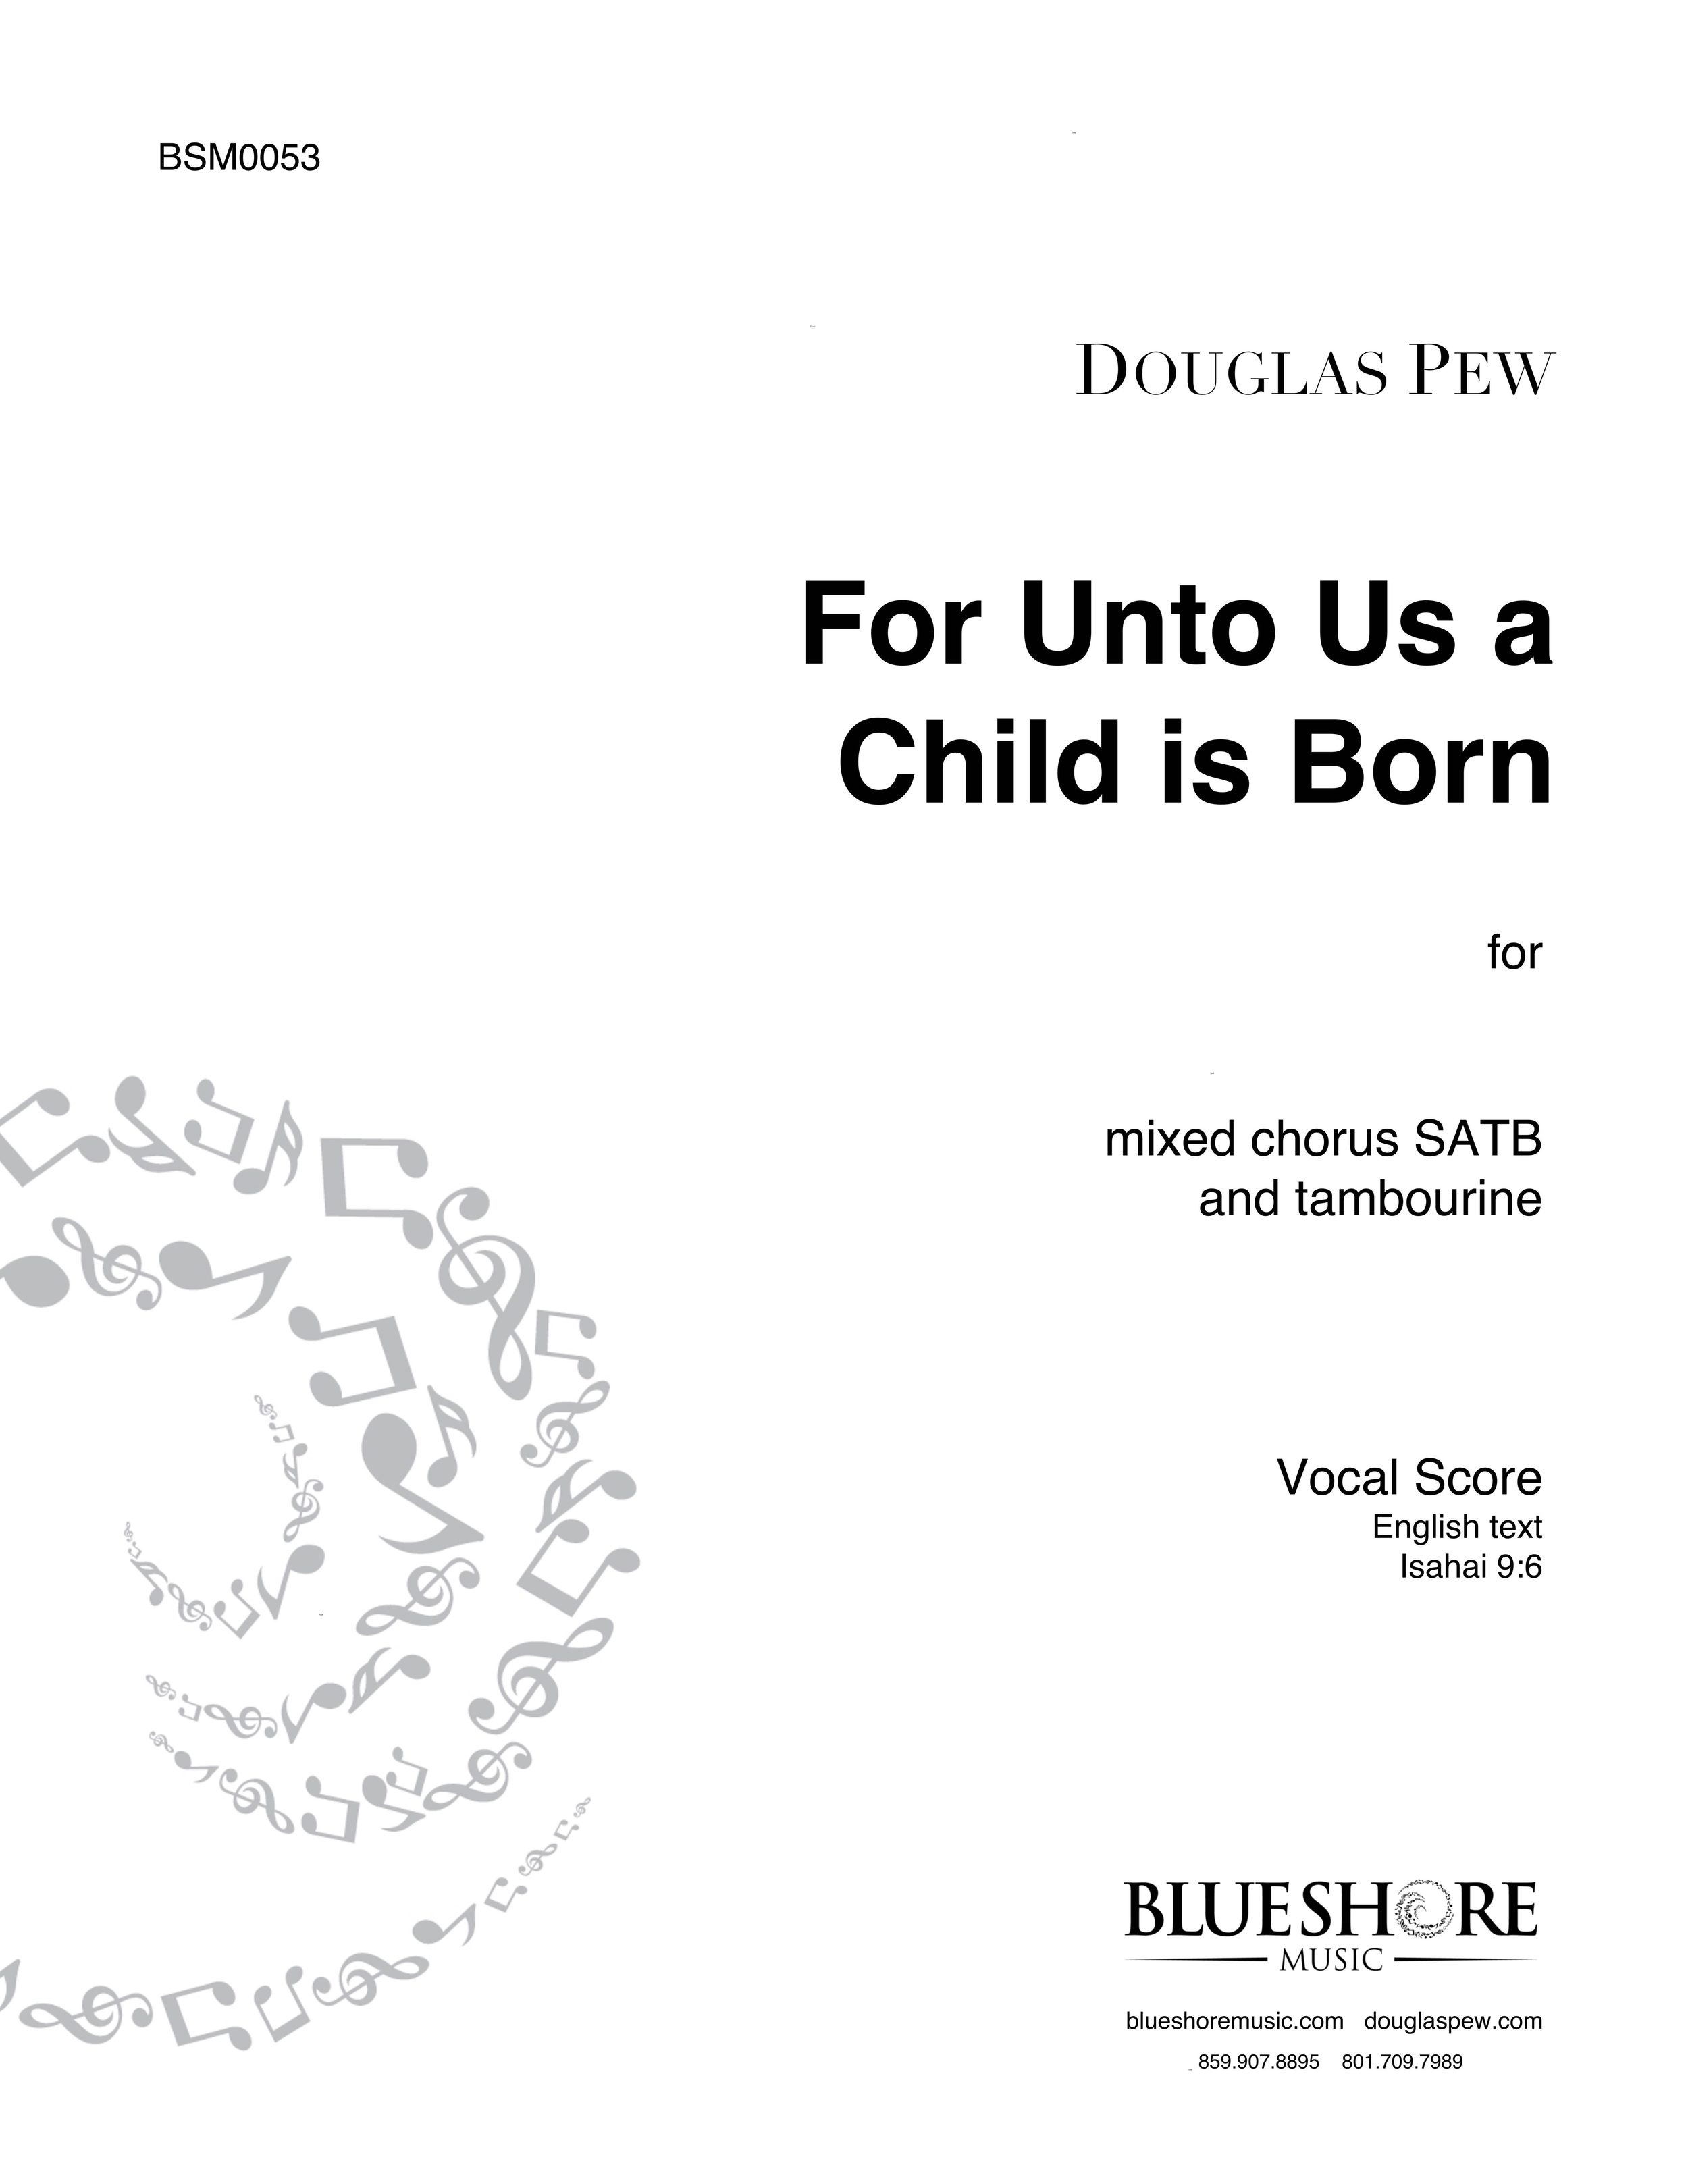 For Unto Us A Child Is Born  - SATB and Tambourine